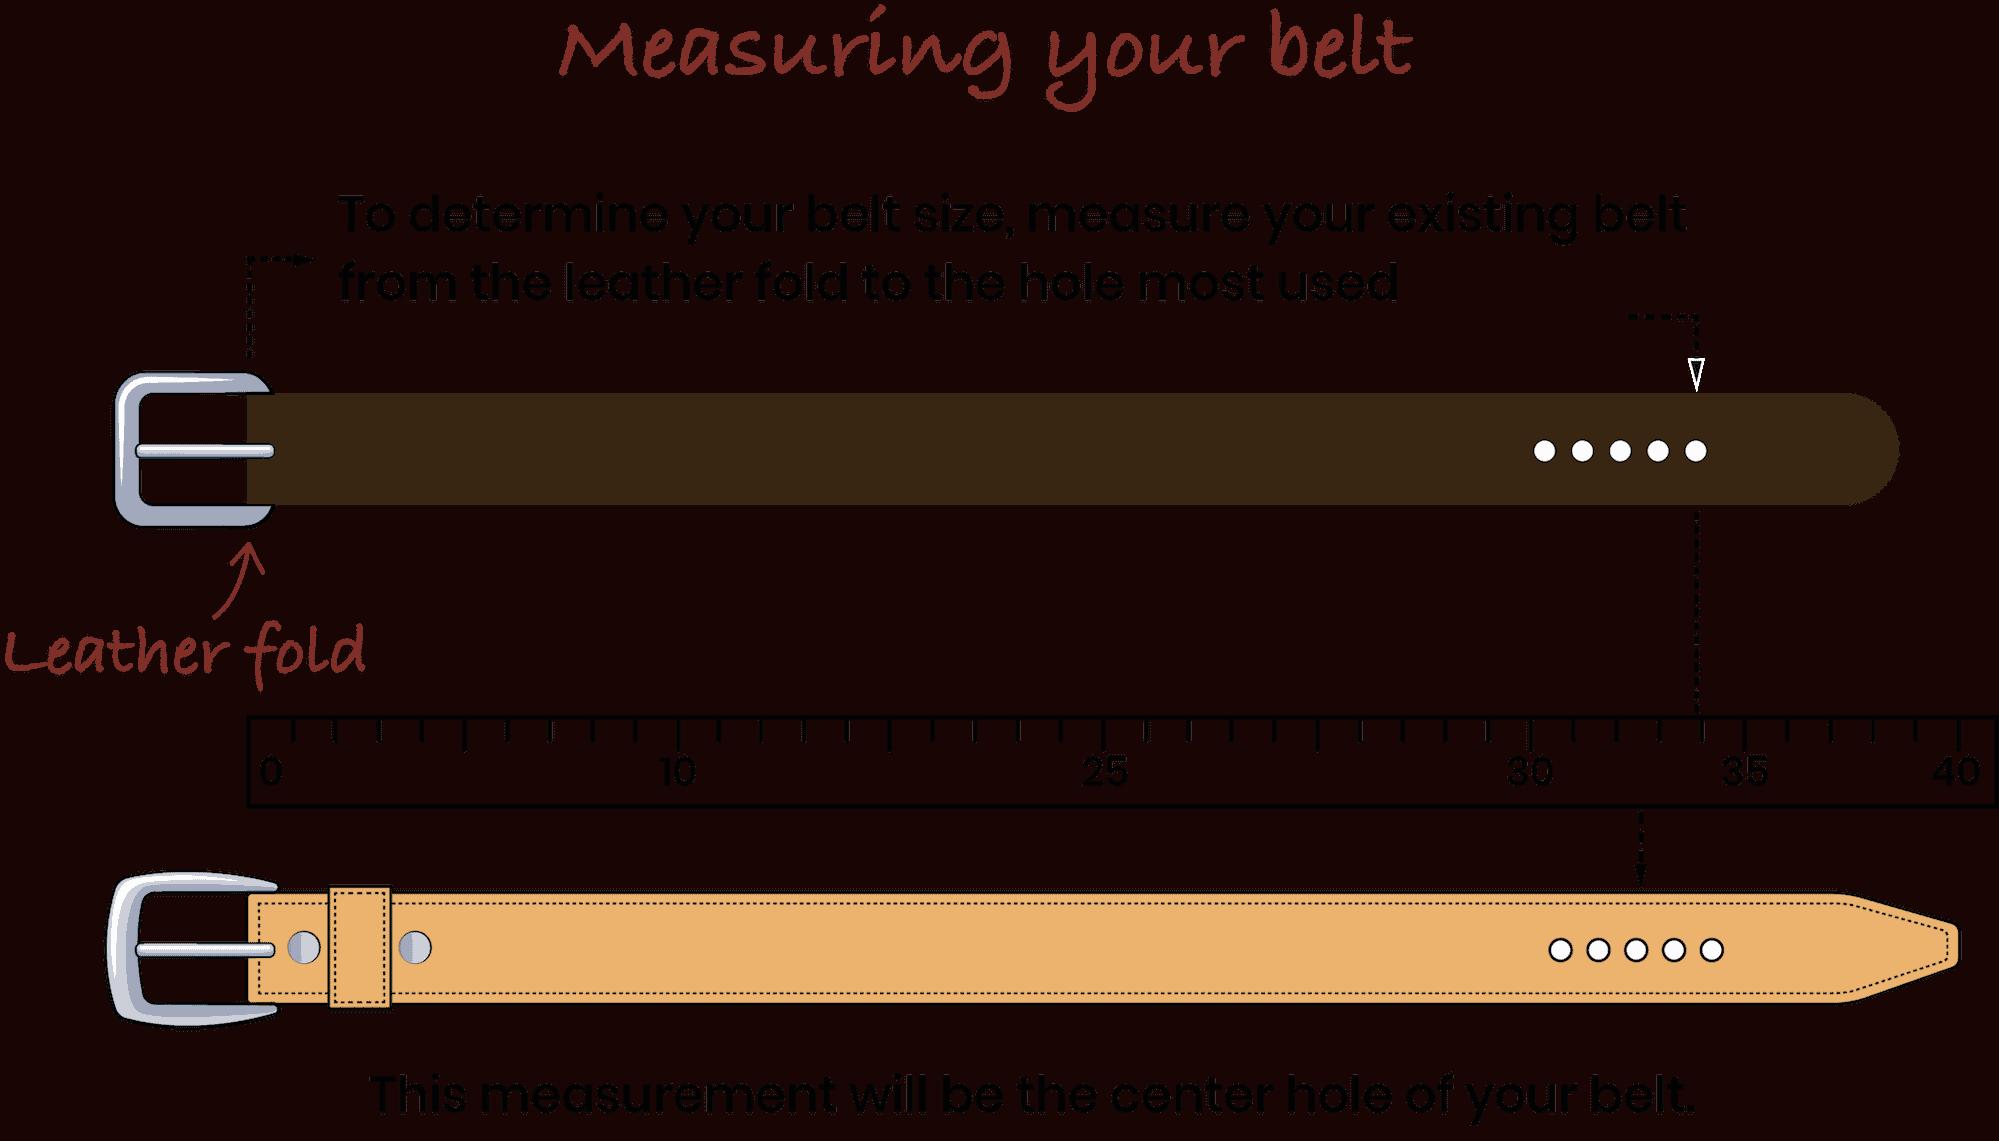 measure your belt diagram